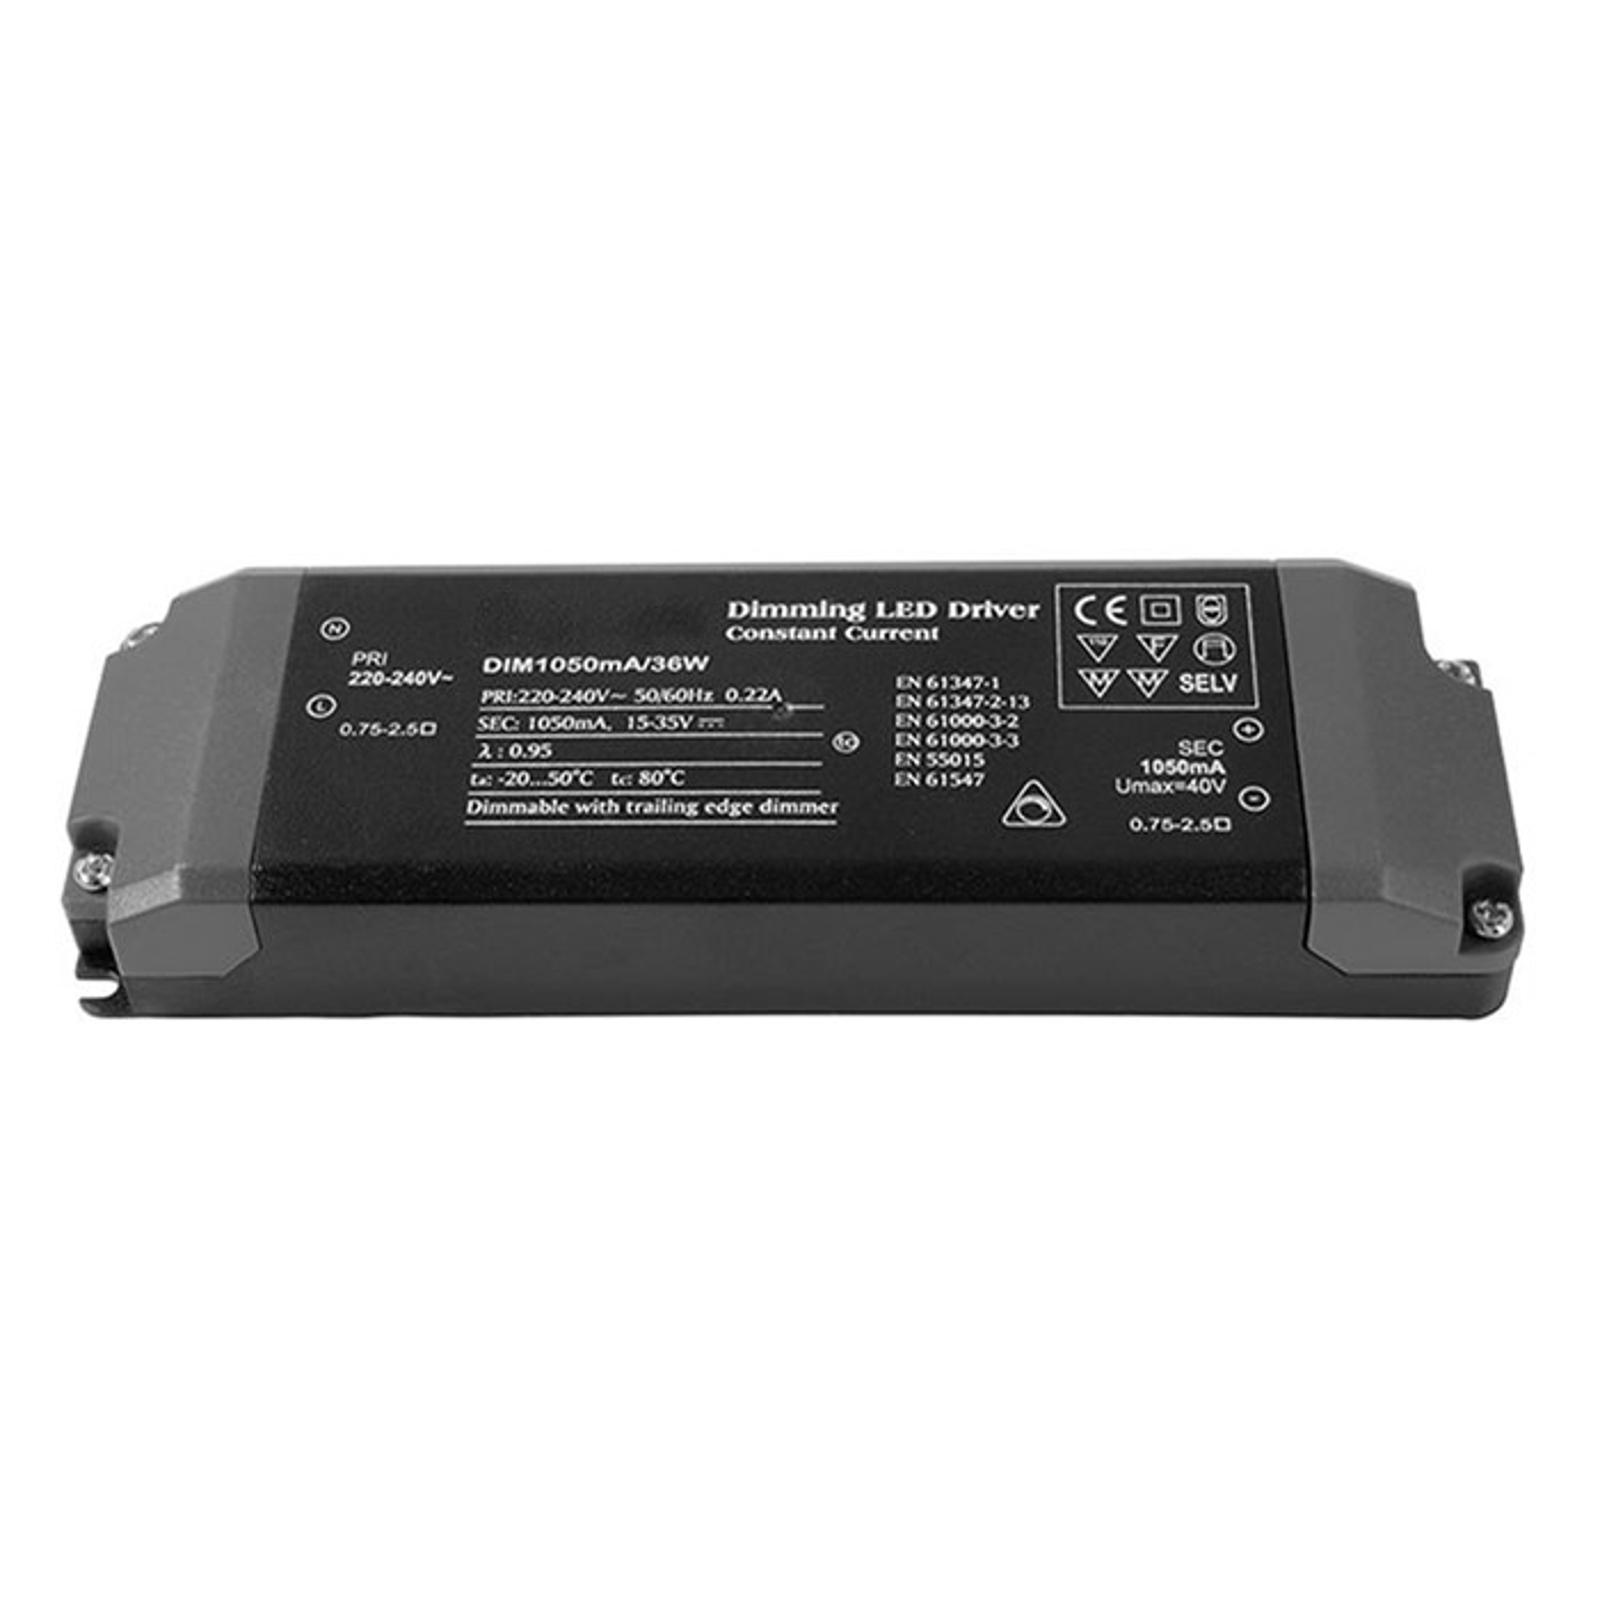 Konstantstrom-Netzgerät LED, 1050mA, 40W, dimmbar